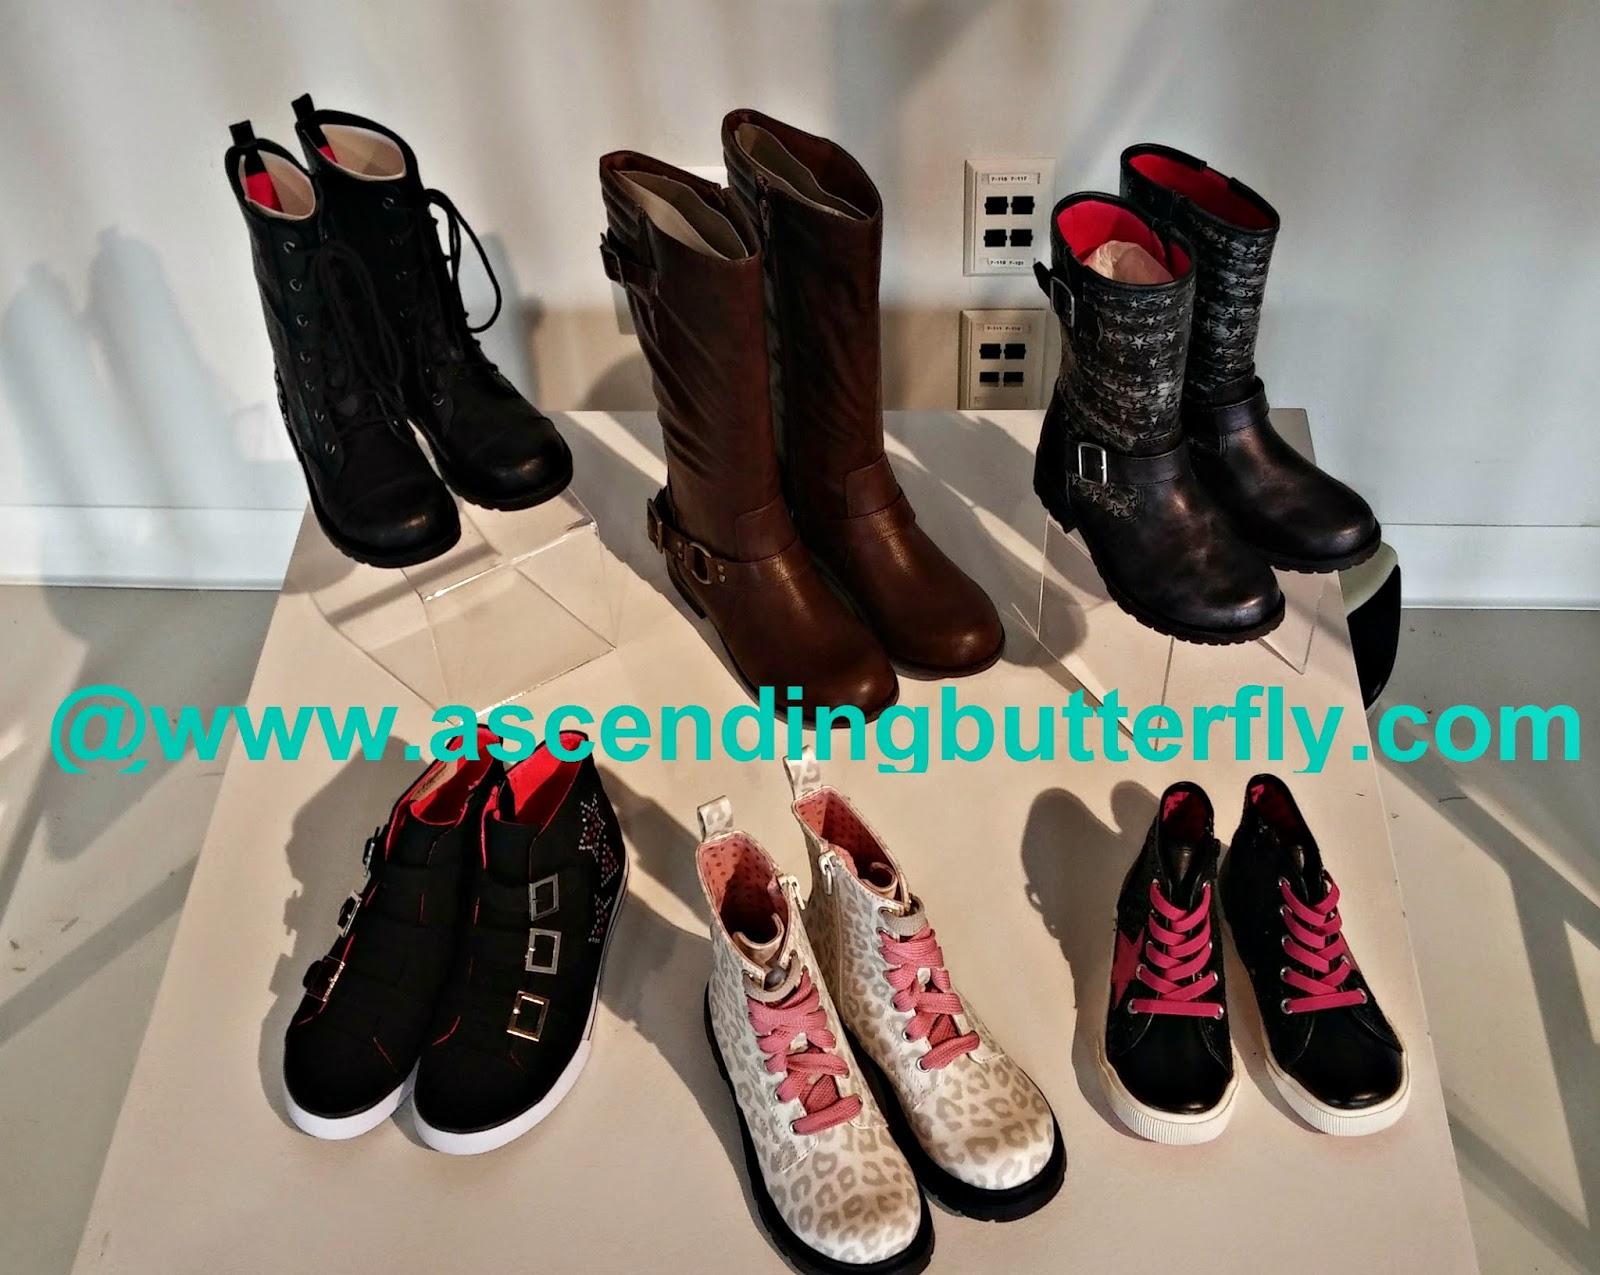 Girls Footwear via JCPenney 2014 Back-to-School Press Preview, Shoes, Girls, Fashion Footwear